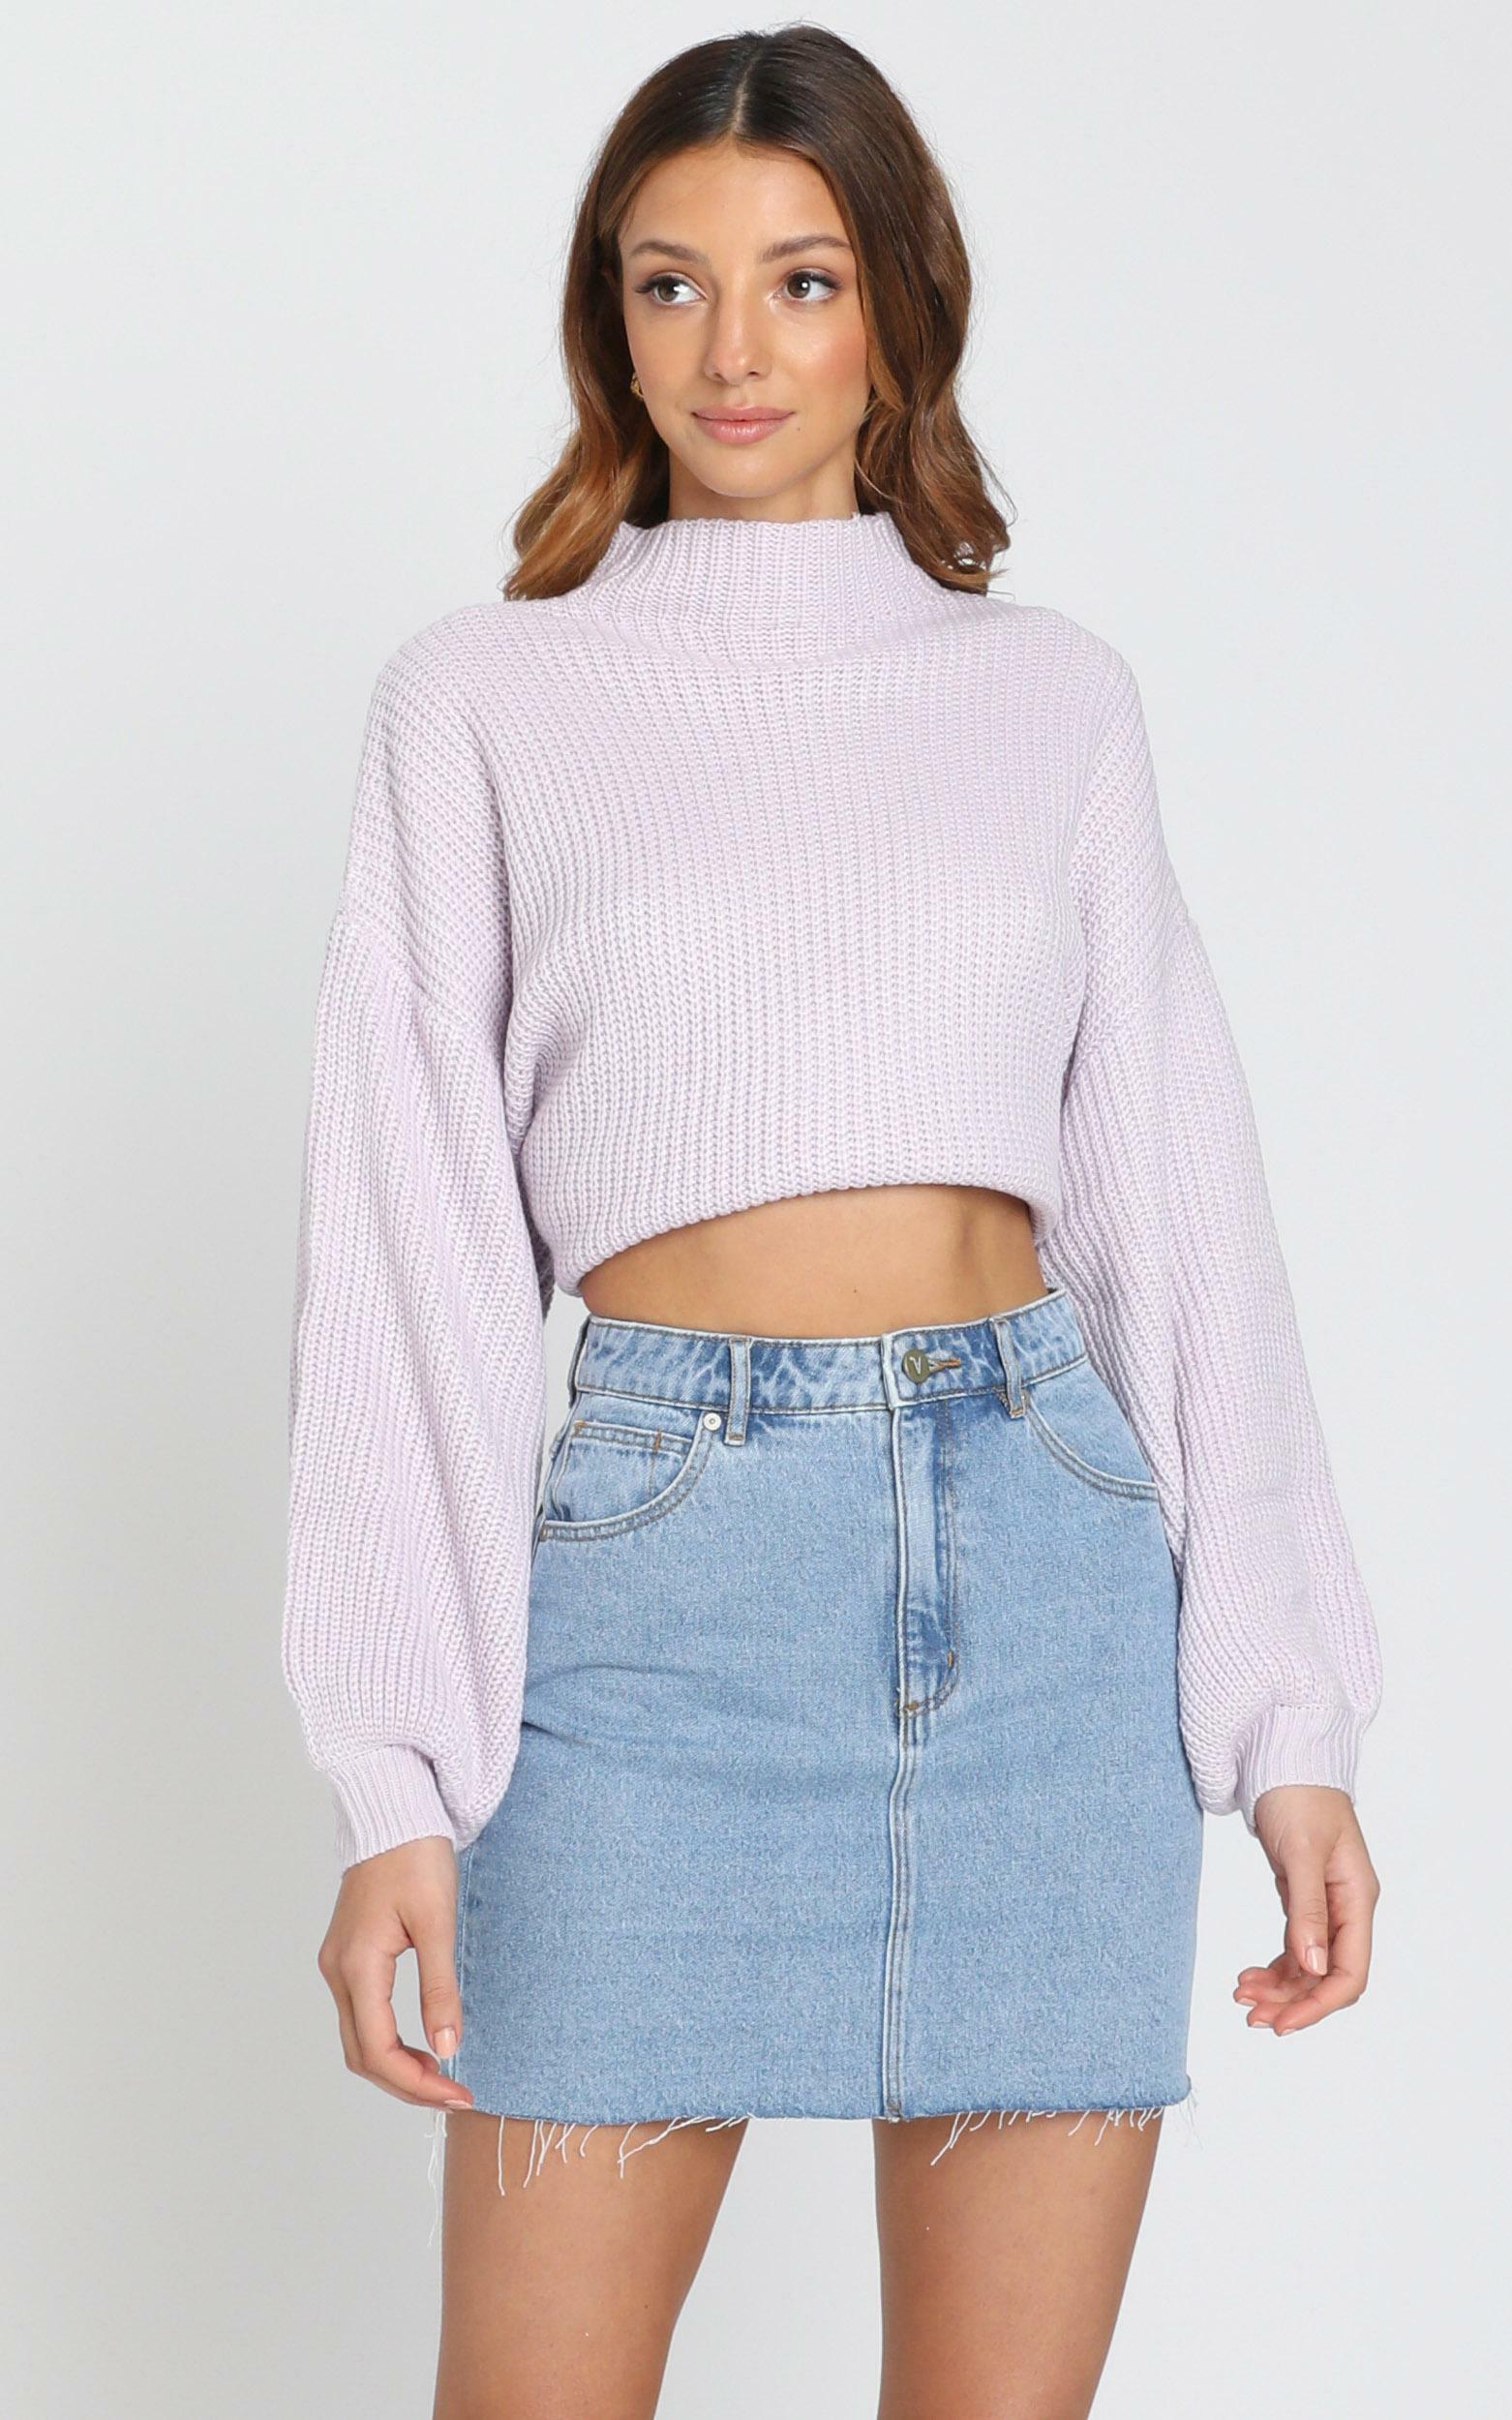 I Feel Love Oversized Knit Jumper in lilac - 8 (S), PRP1, hi-res image number null